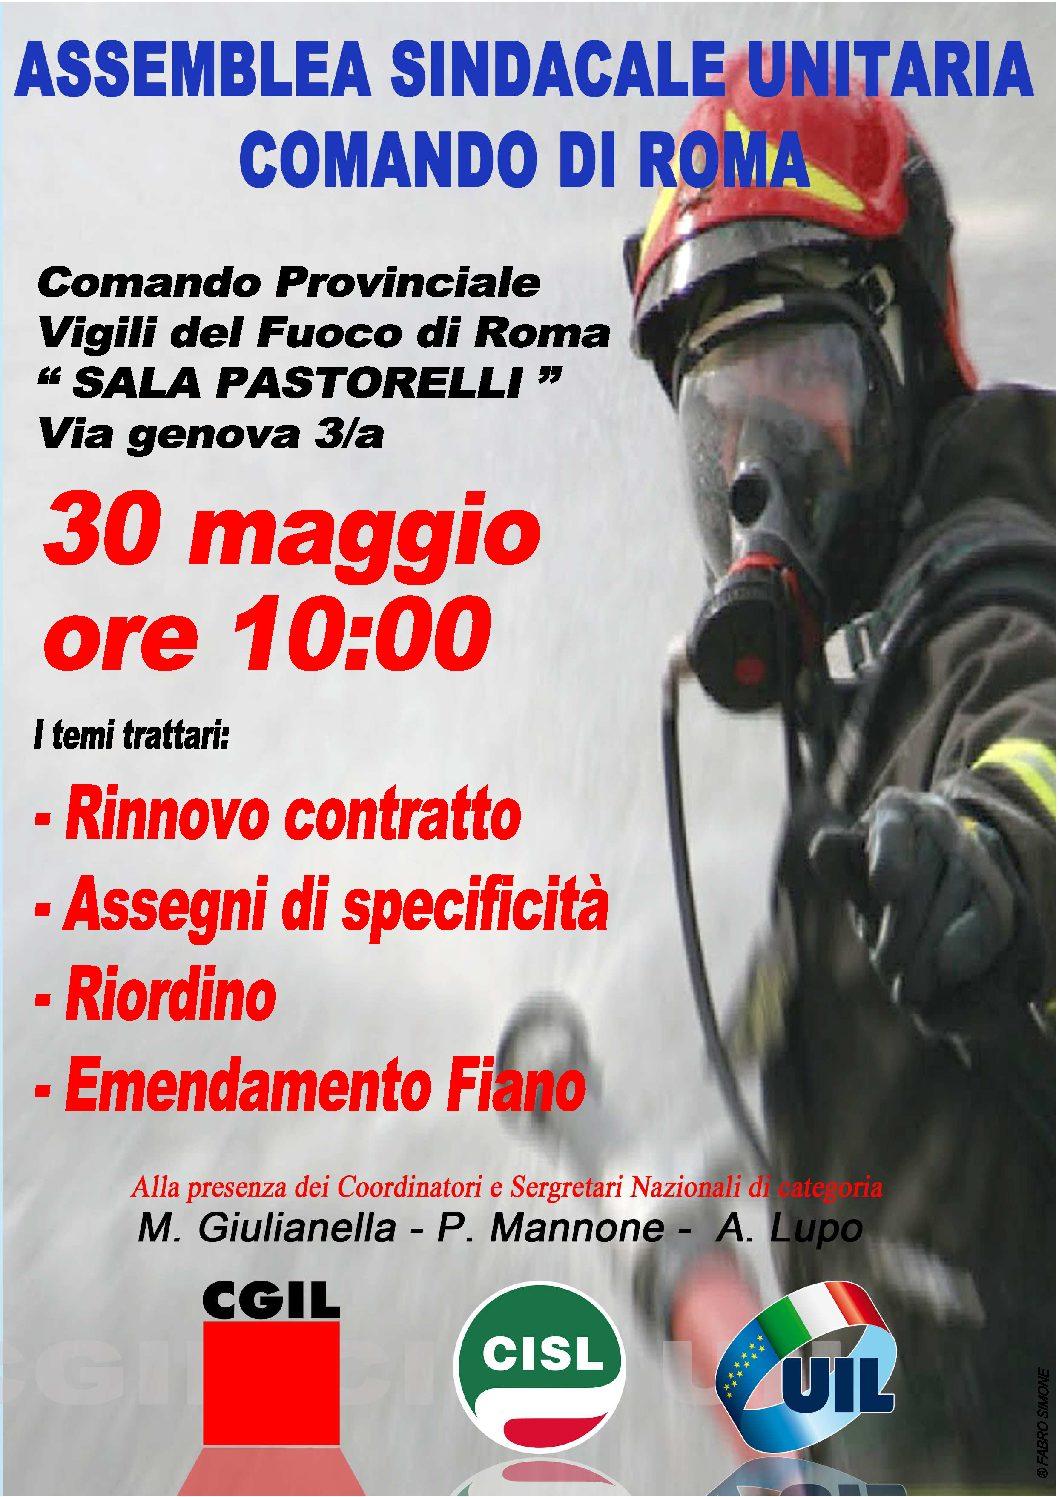 Volantino-4.psd-1-pdf Roma: intervento UILPAVVF assemblea unitaria